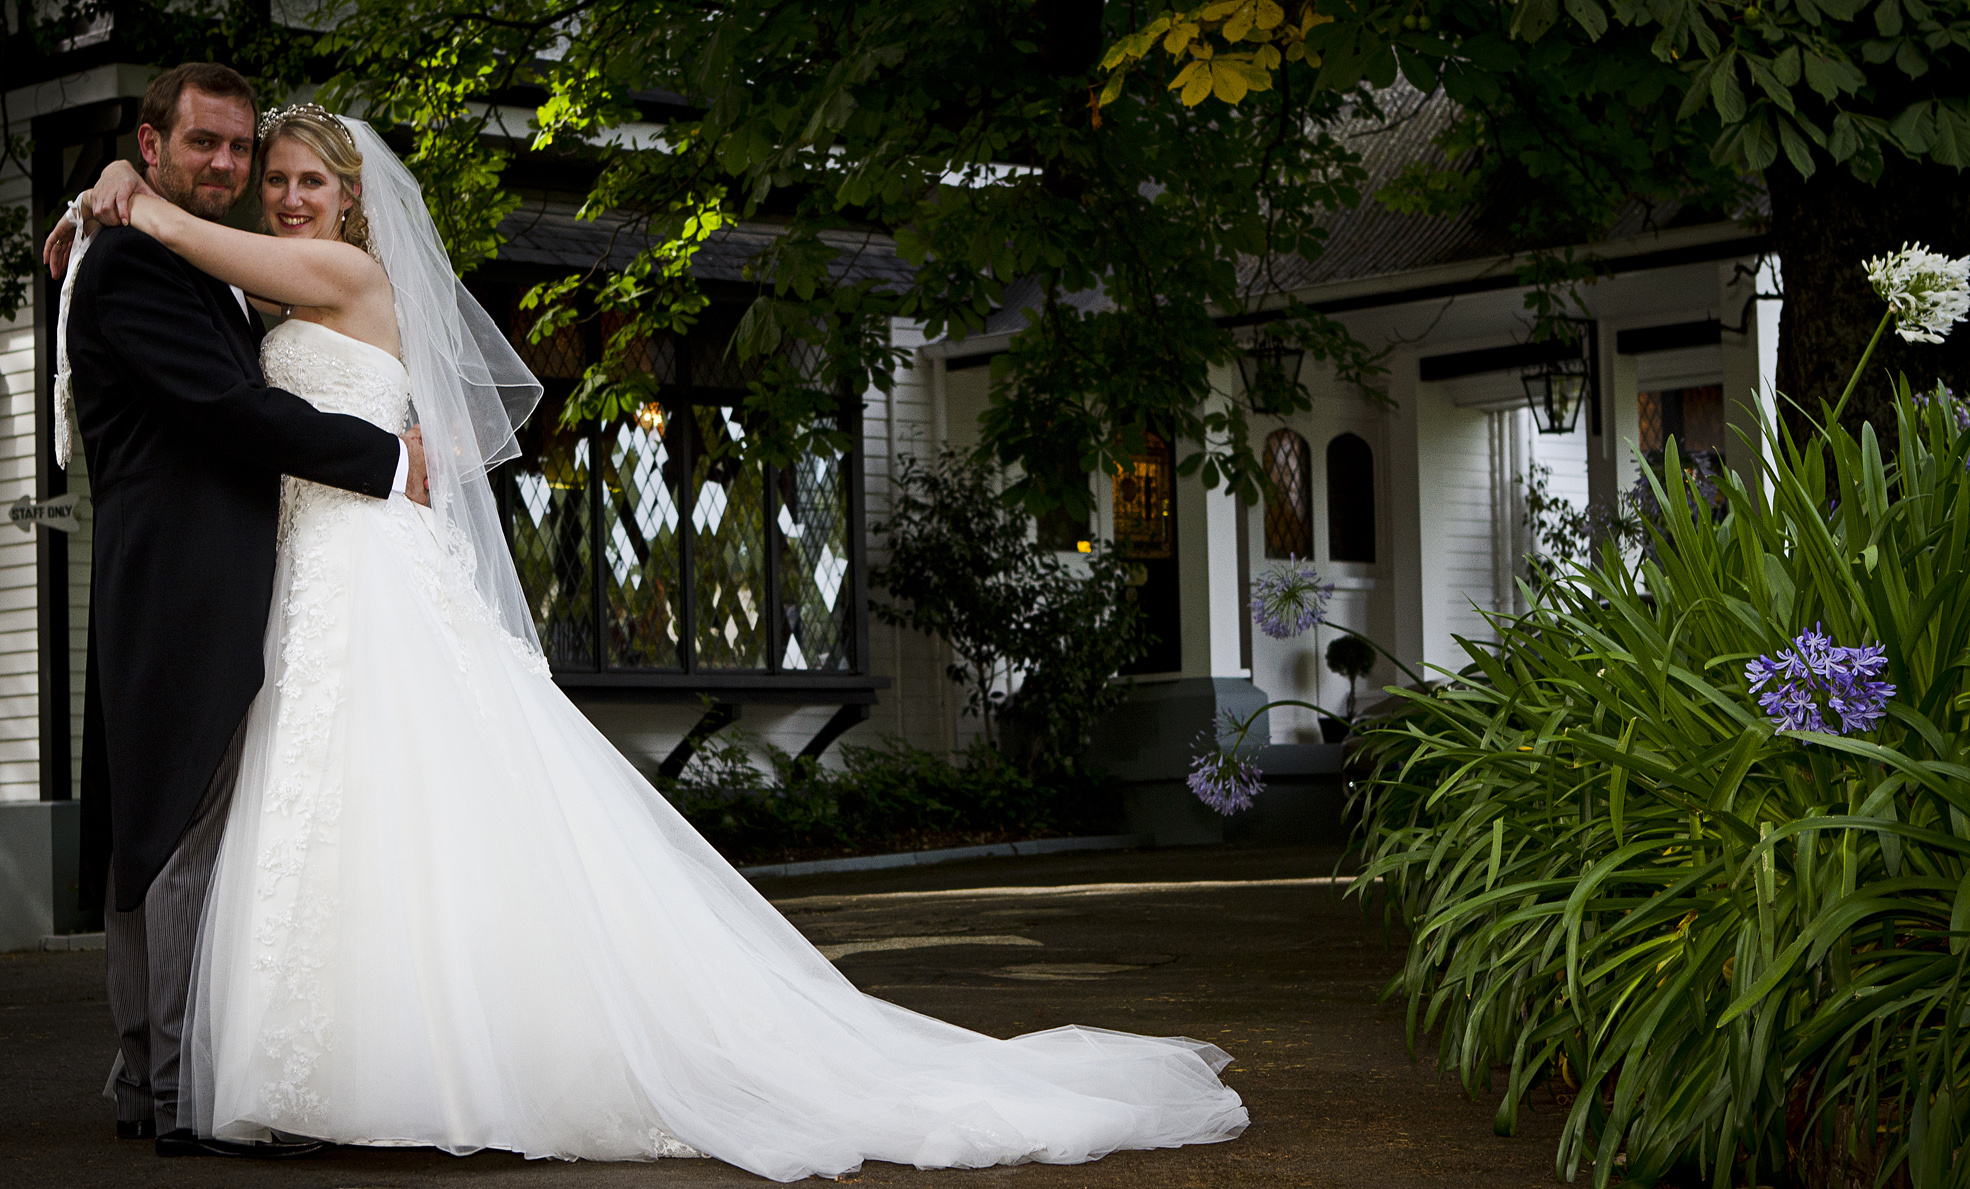 Wedding Venue In The Wairarapa